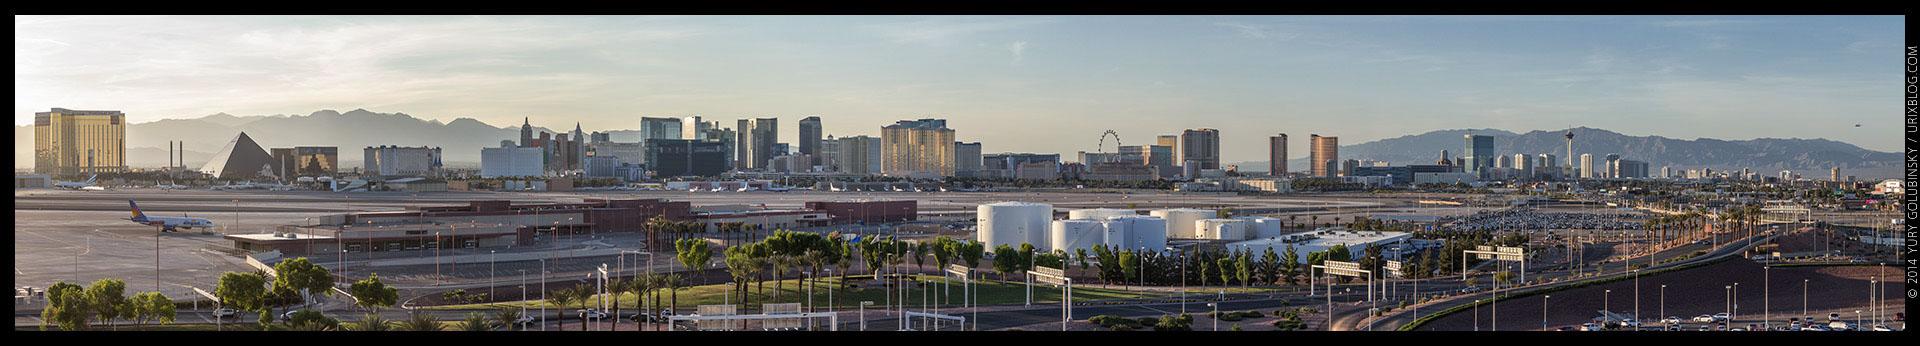 Mandalay Bay, Stratosphere tower, casino, hotel, 2014, LAS, Las Vegas McCarran International airport, strip, LV, Clark County, USA, Nevada, panorama, horizon, city